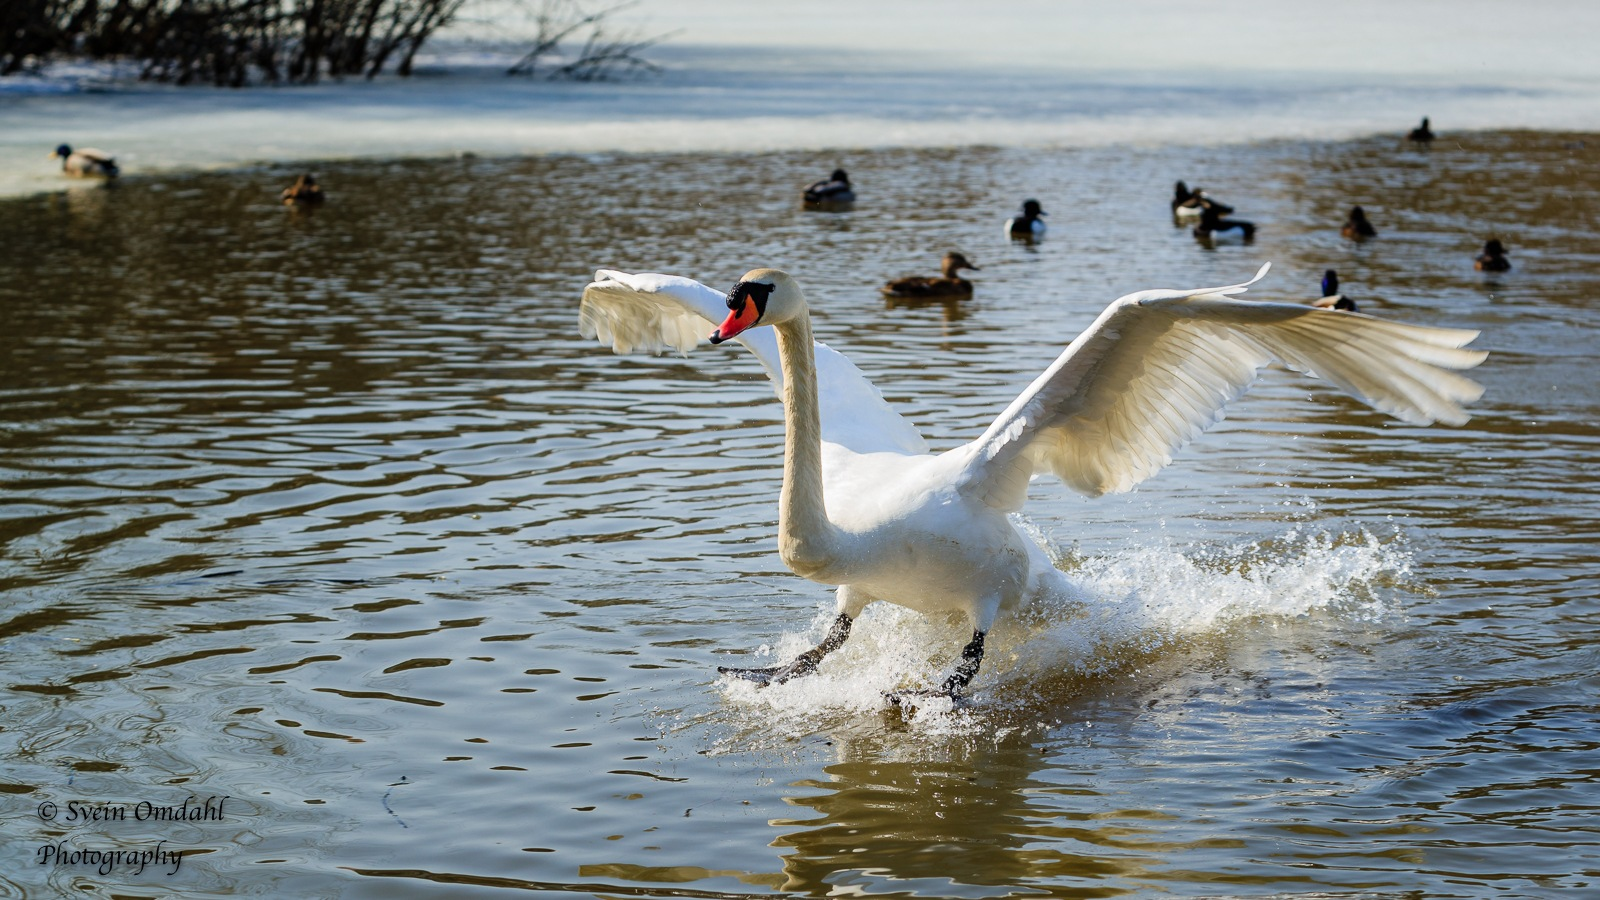 Mute swan by Svein Omdahl